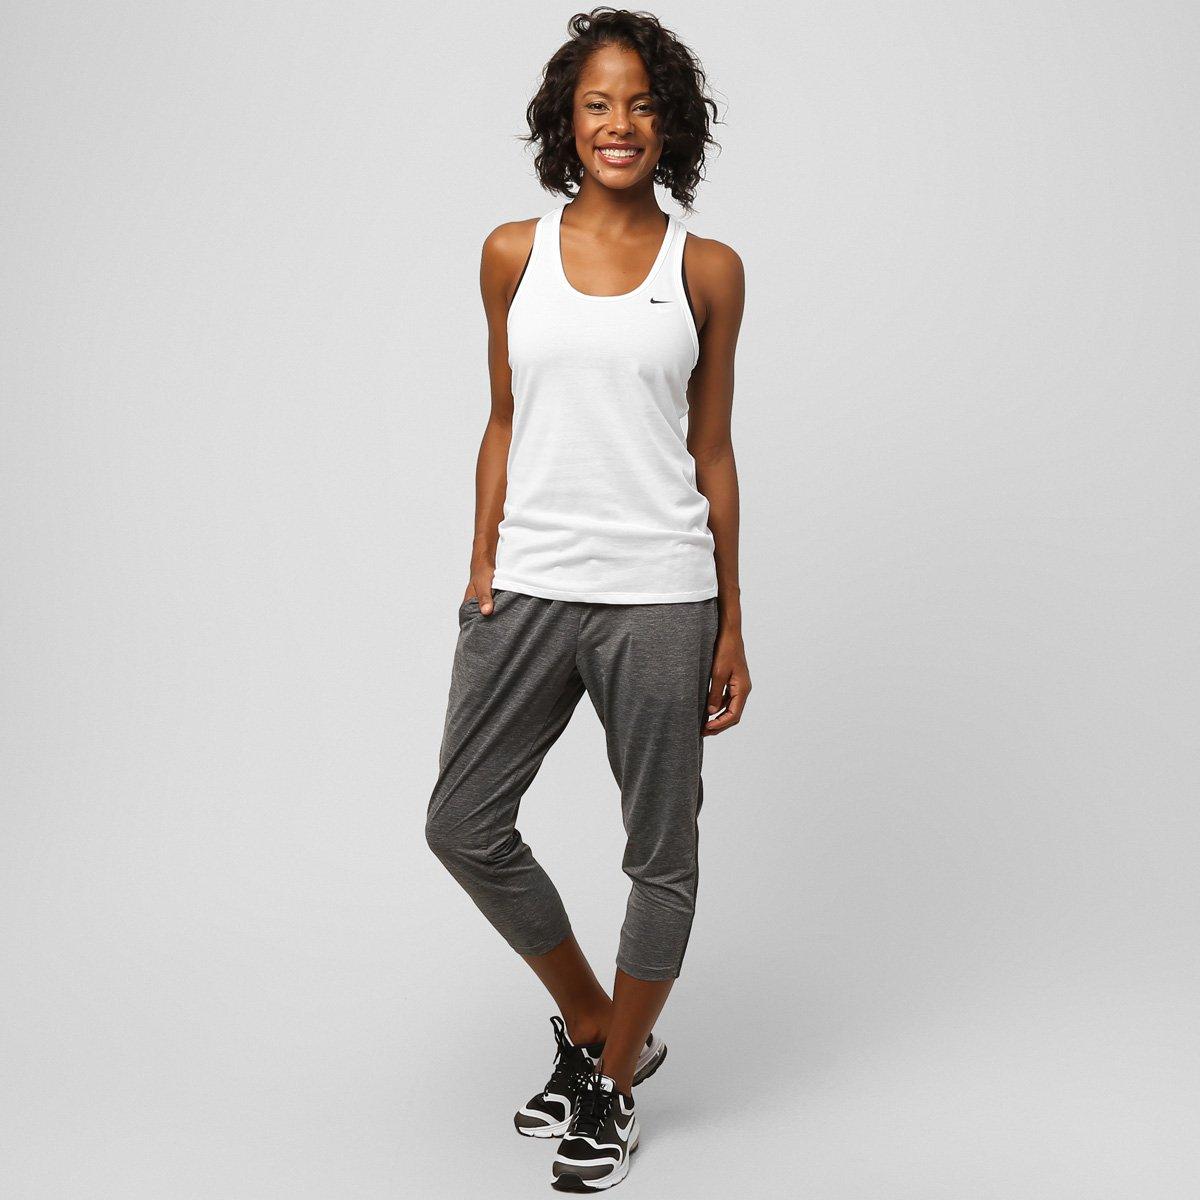 Nike Agora Camiseta Fitness Netshoes Compre 5 Regata qXvw6Z5BwA 6b2f036c93d